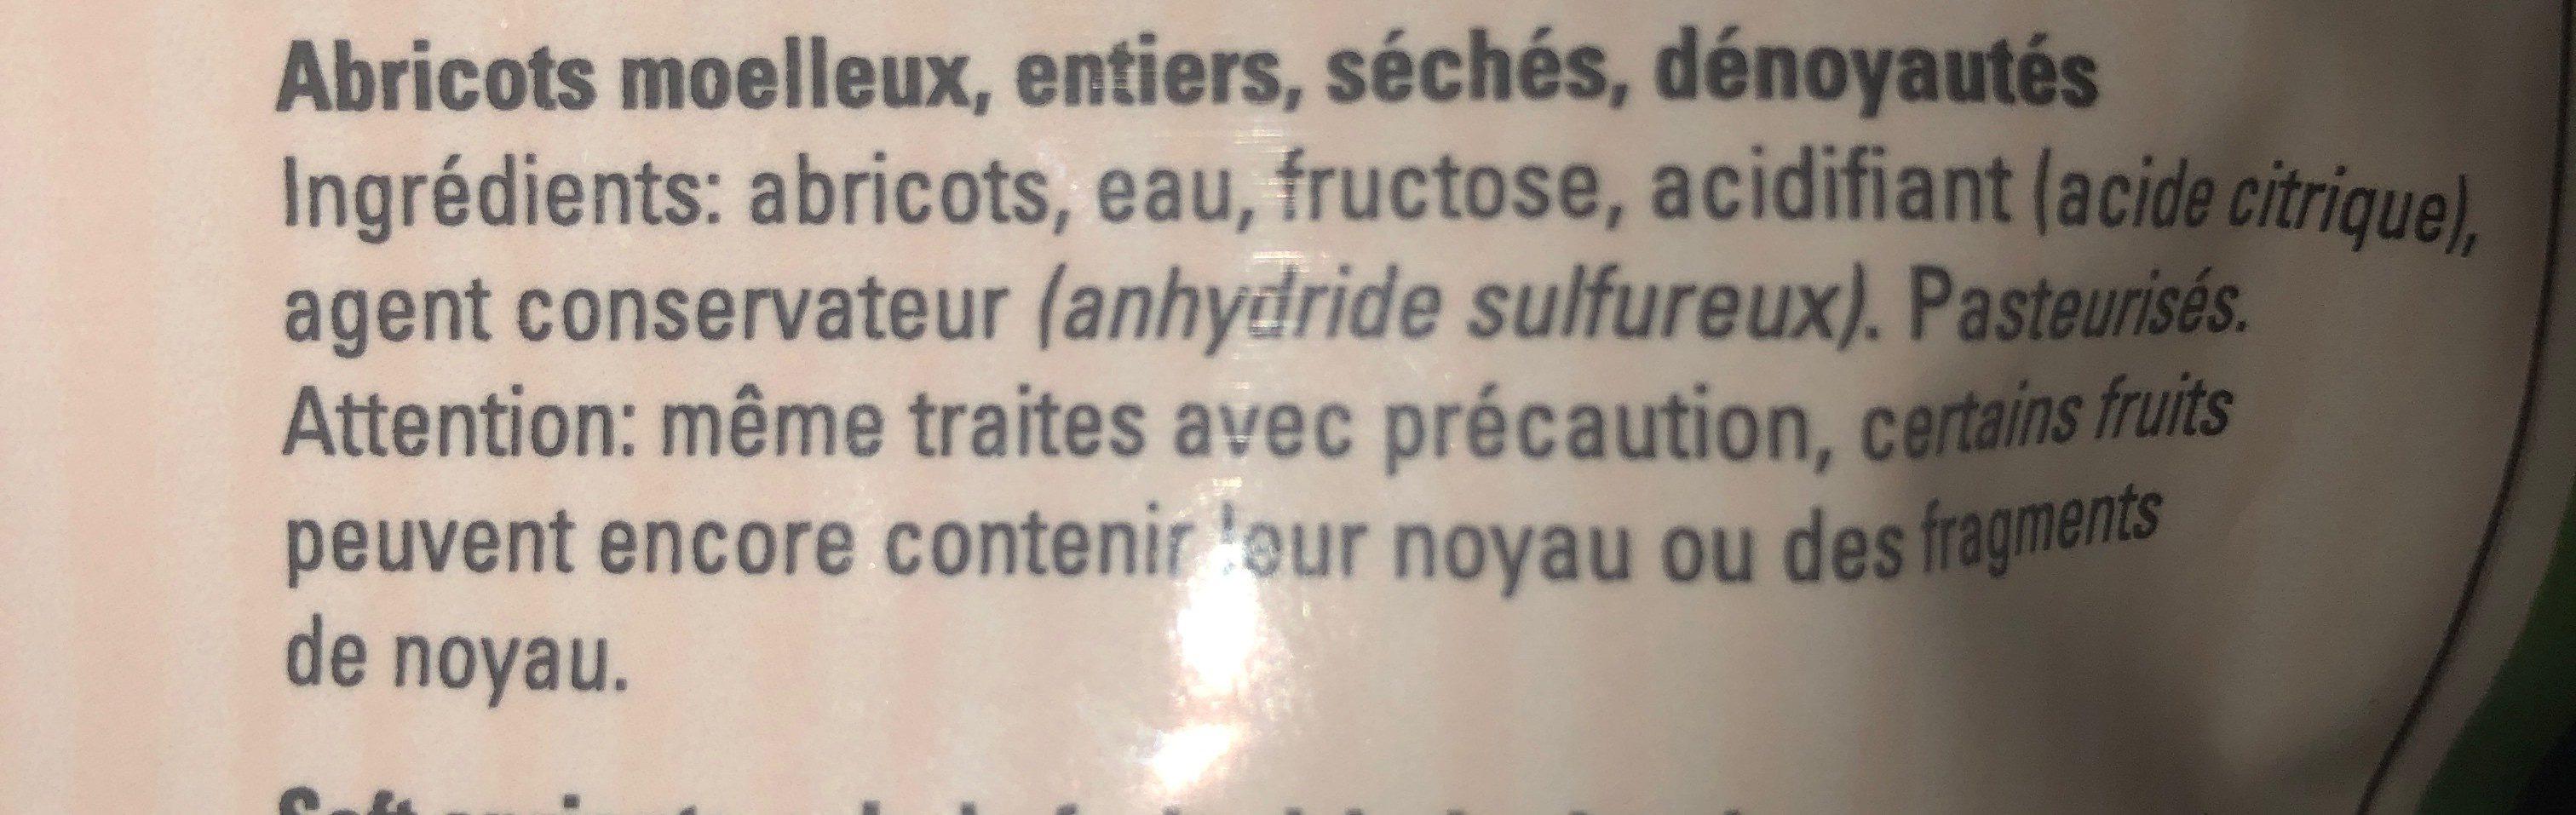 Necta Abricot Tendre Denoyaute - Ingrédients - fr